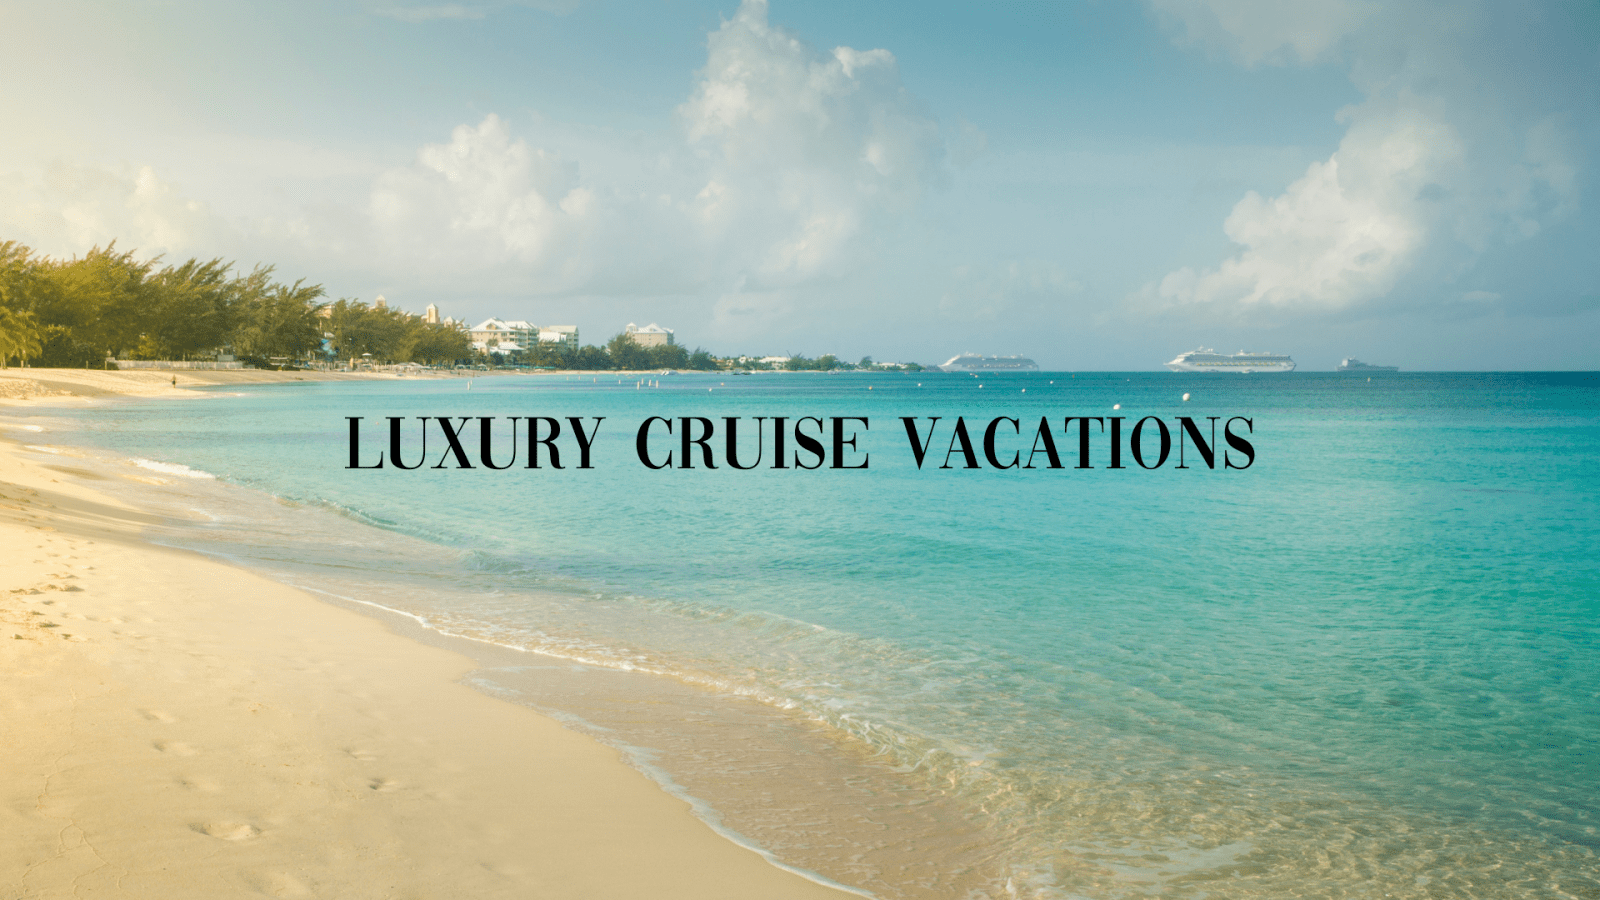 Luxury Cruise Vacations Header Image